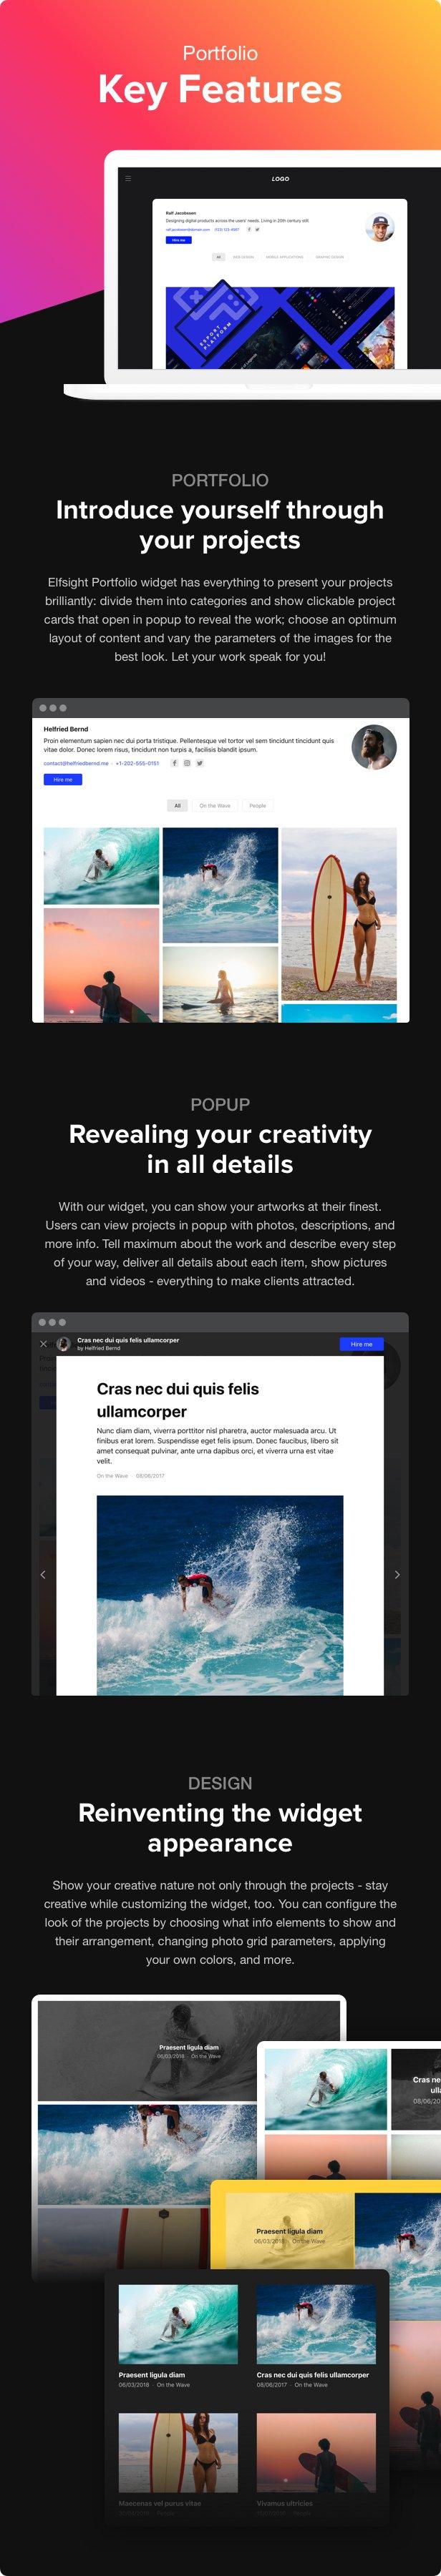 Portfolio Gallery - WordPress Portfolio - 1